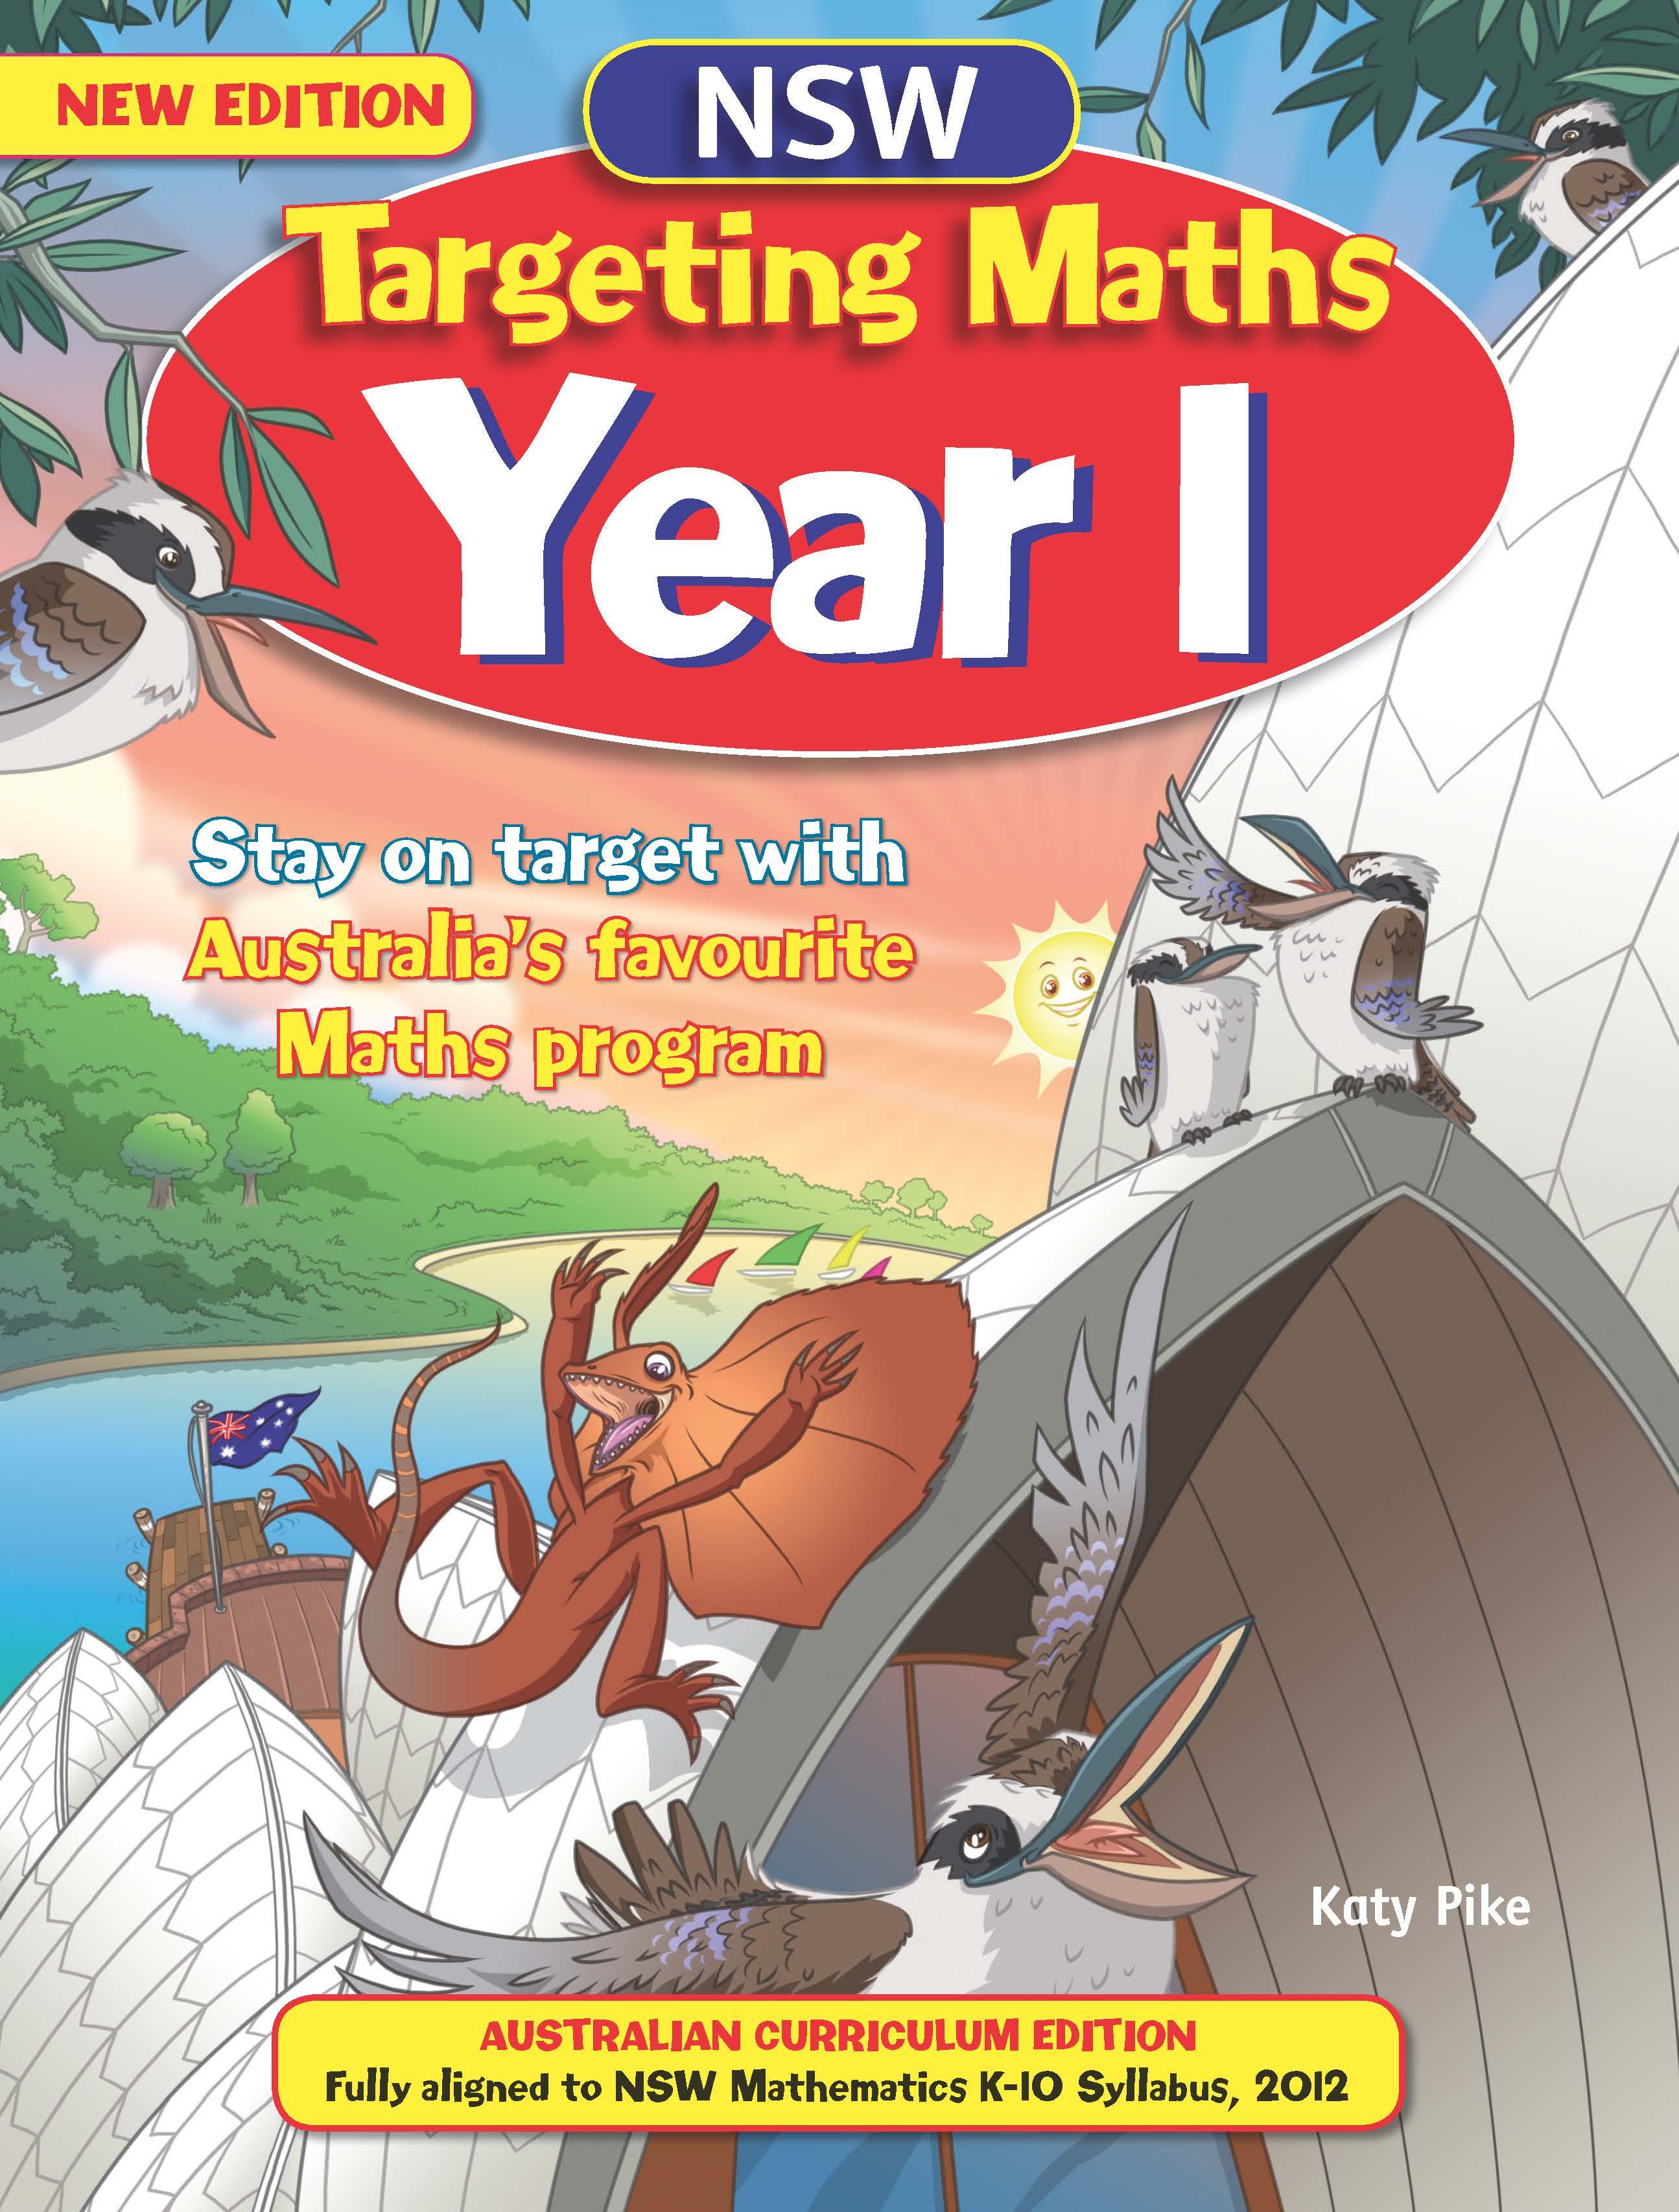 NSW Targeting Maths Australian Curriculum Edition Student Book Year 1